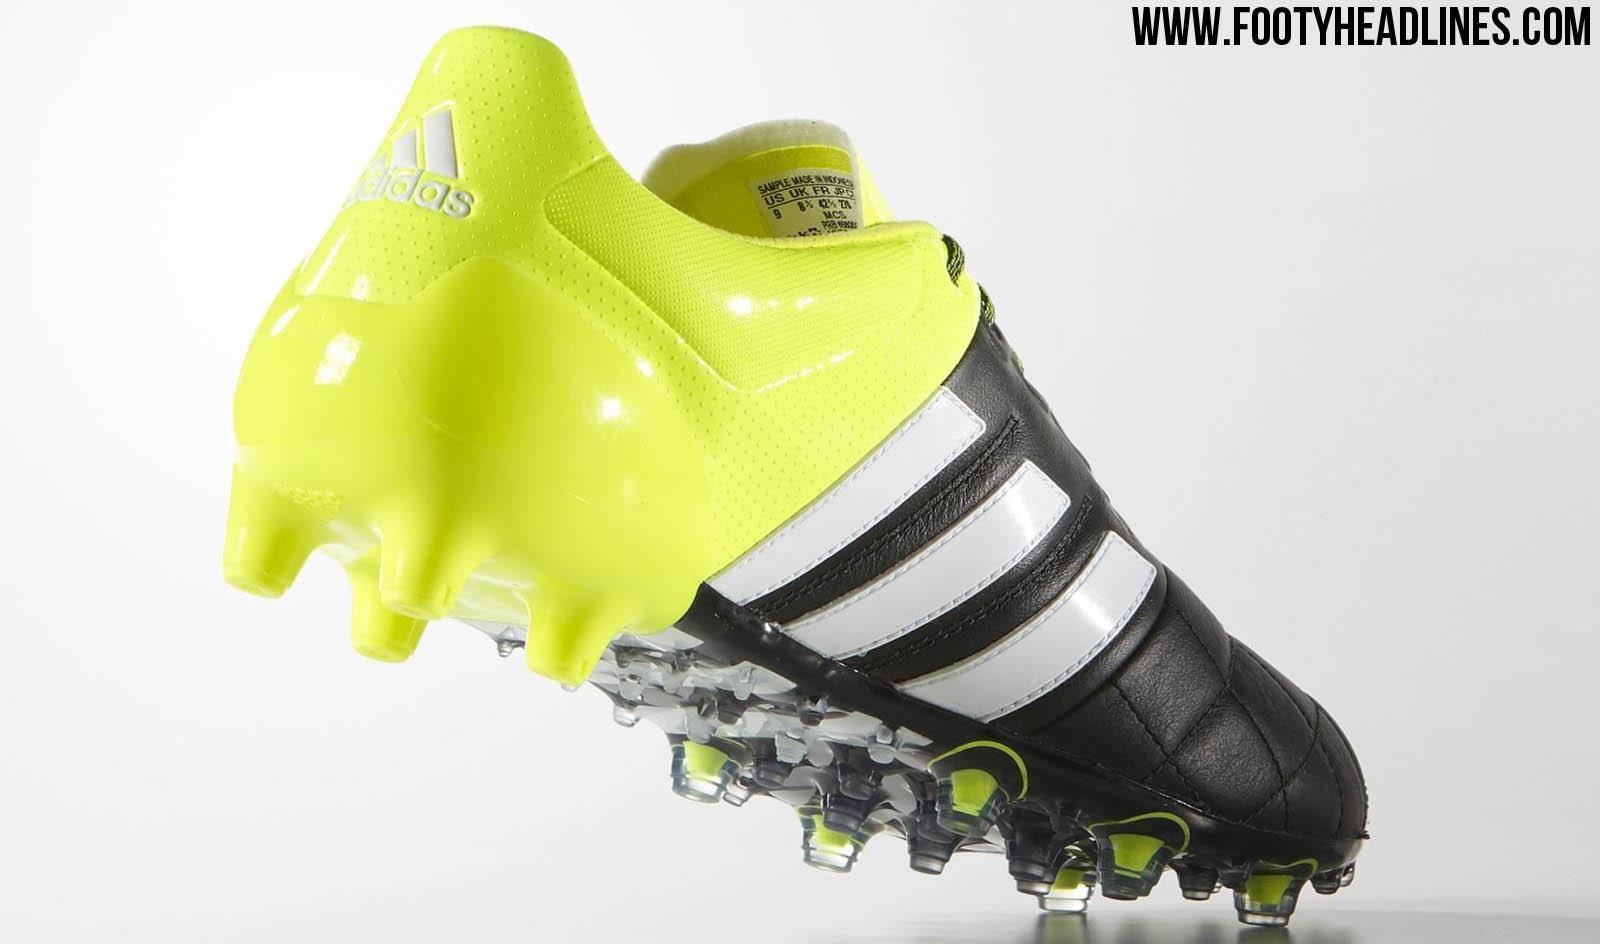 brand new 15290 b81f3 adidas ace 15.1